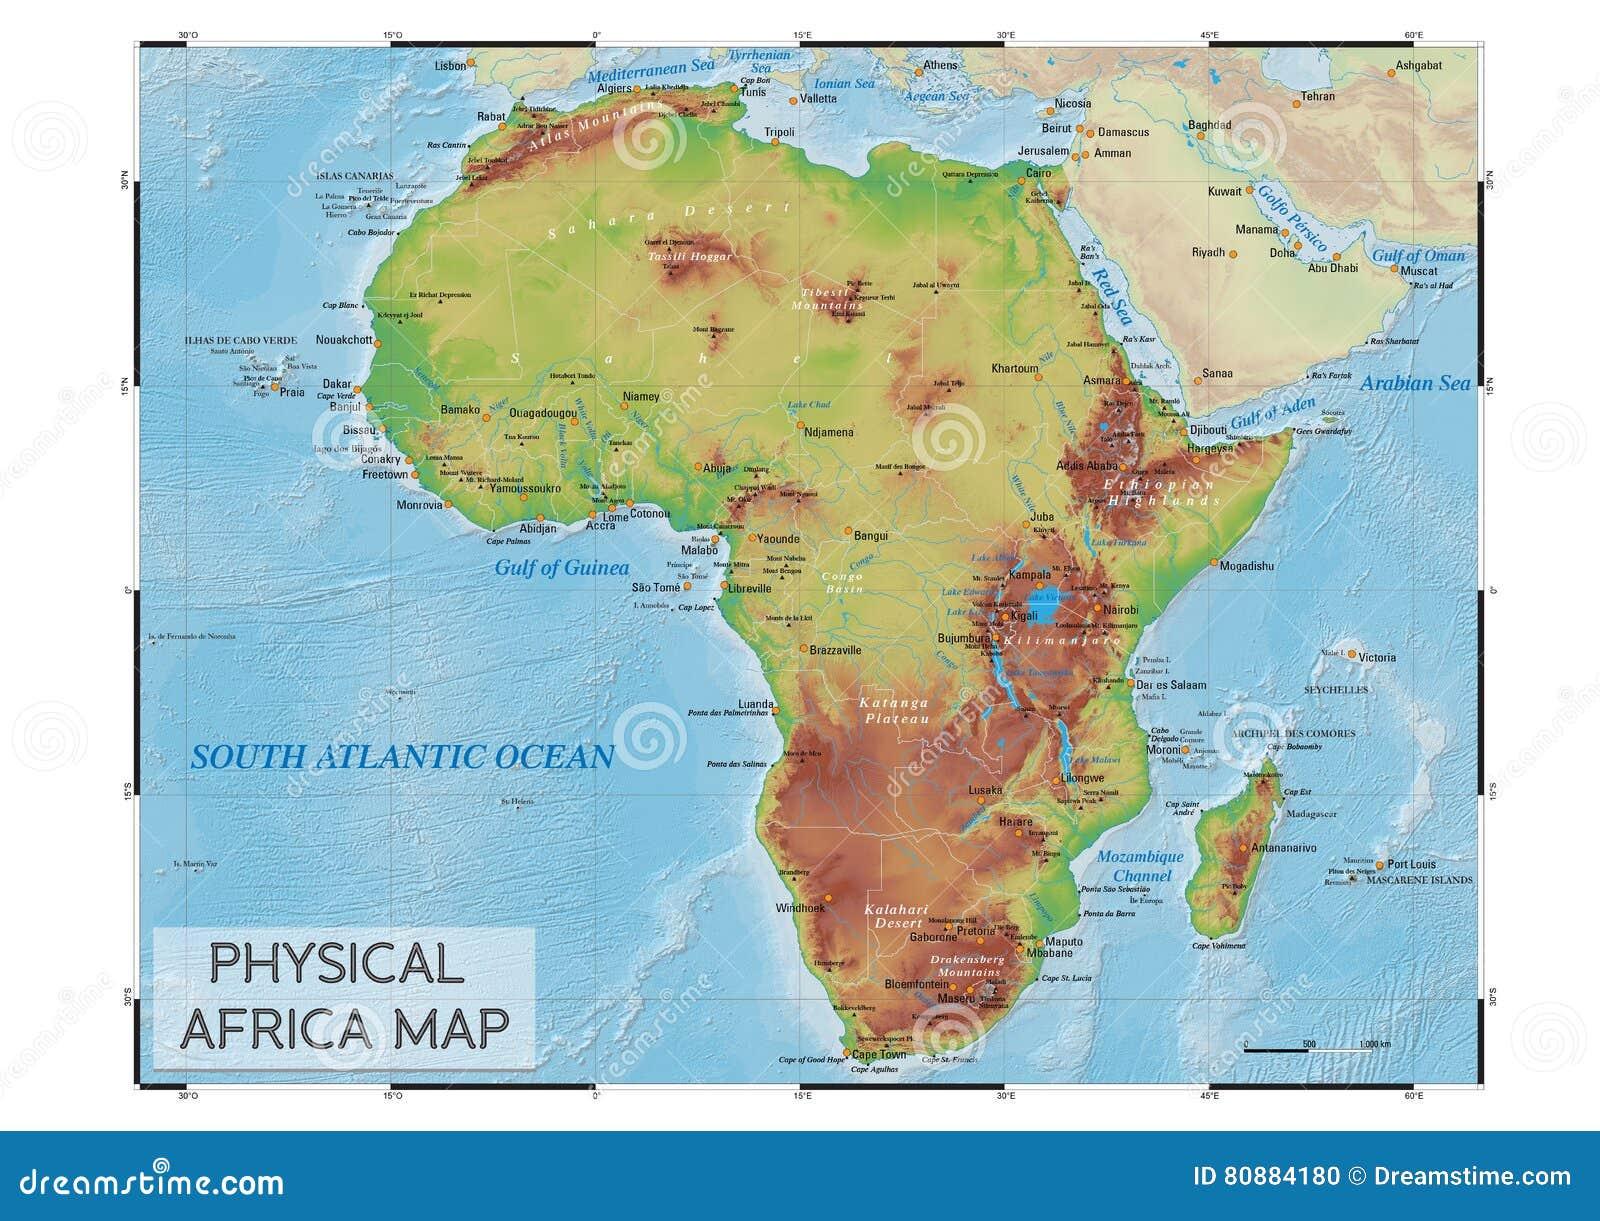 Mapa Fisico De Africa Ilustracao Do Vetor Ilustracao De Mapa